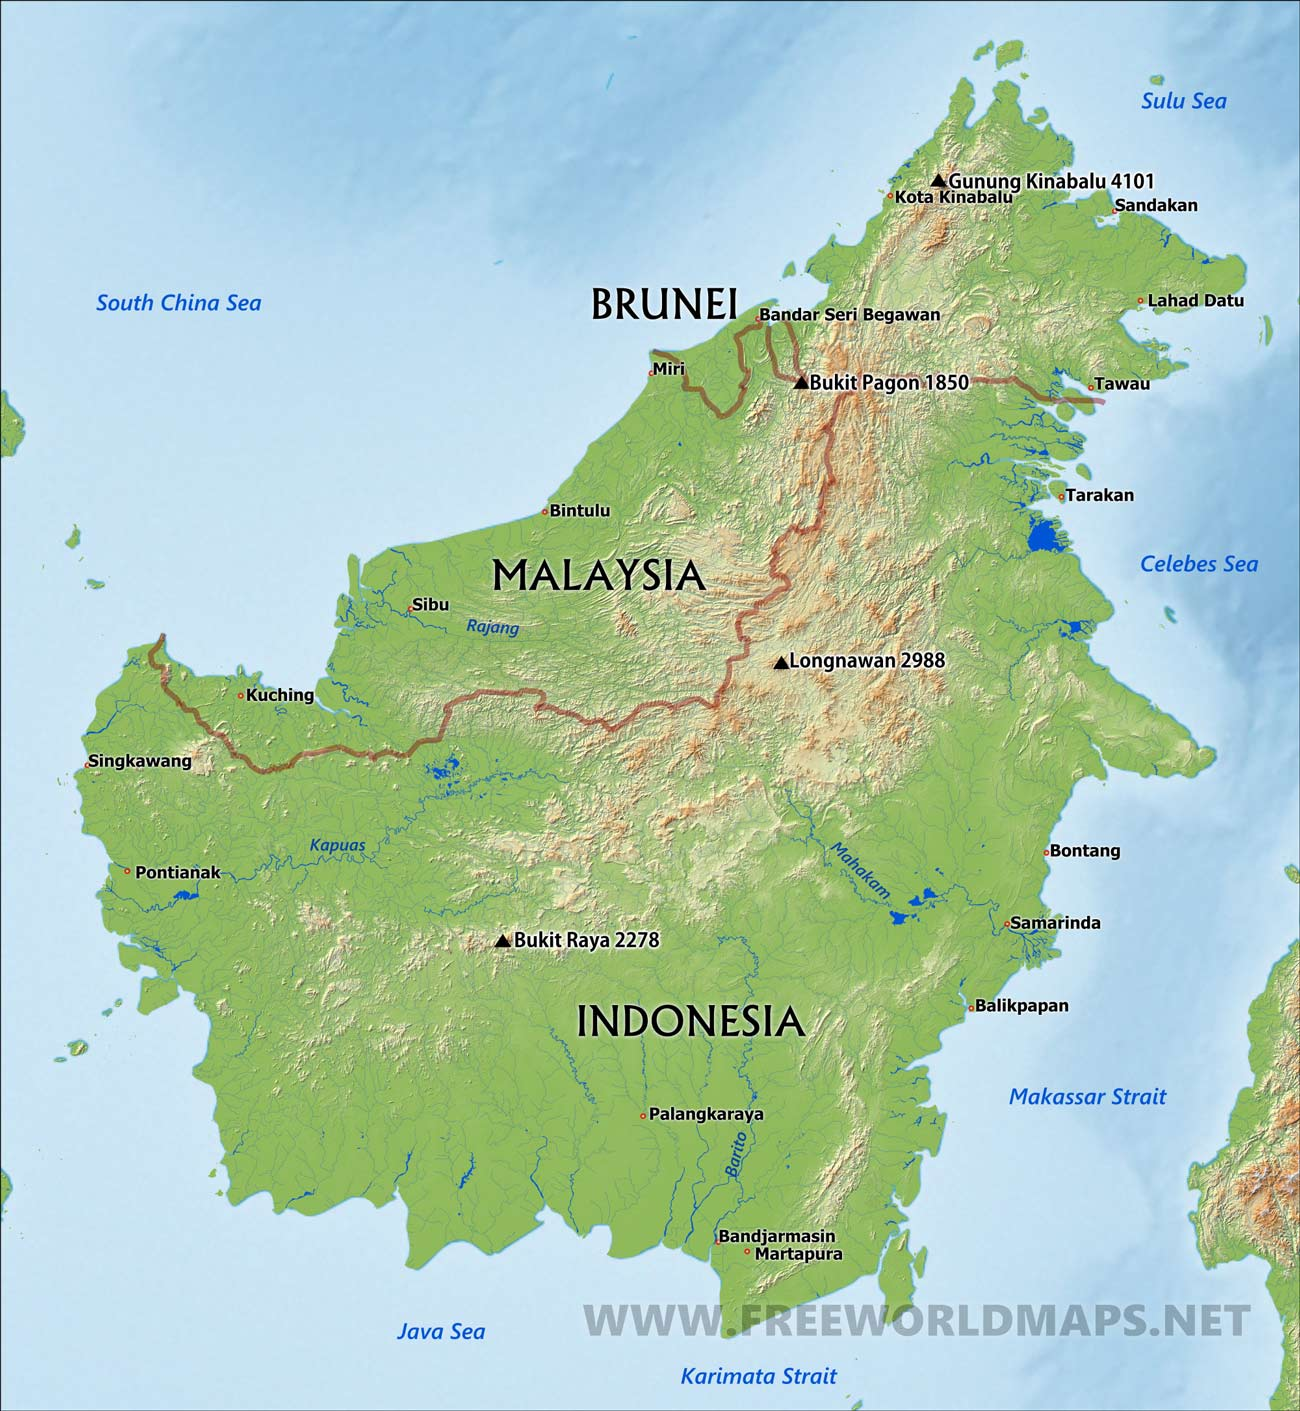 Borneo Island: Soroptimist International